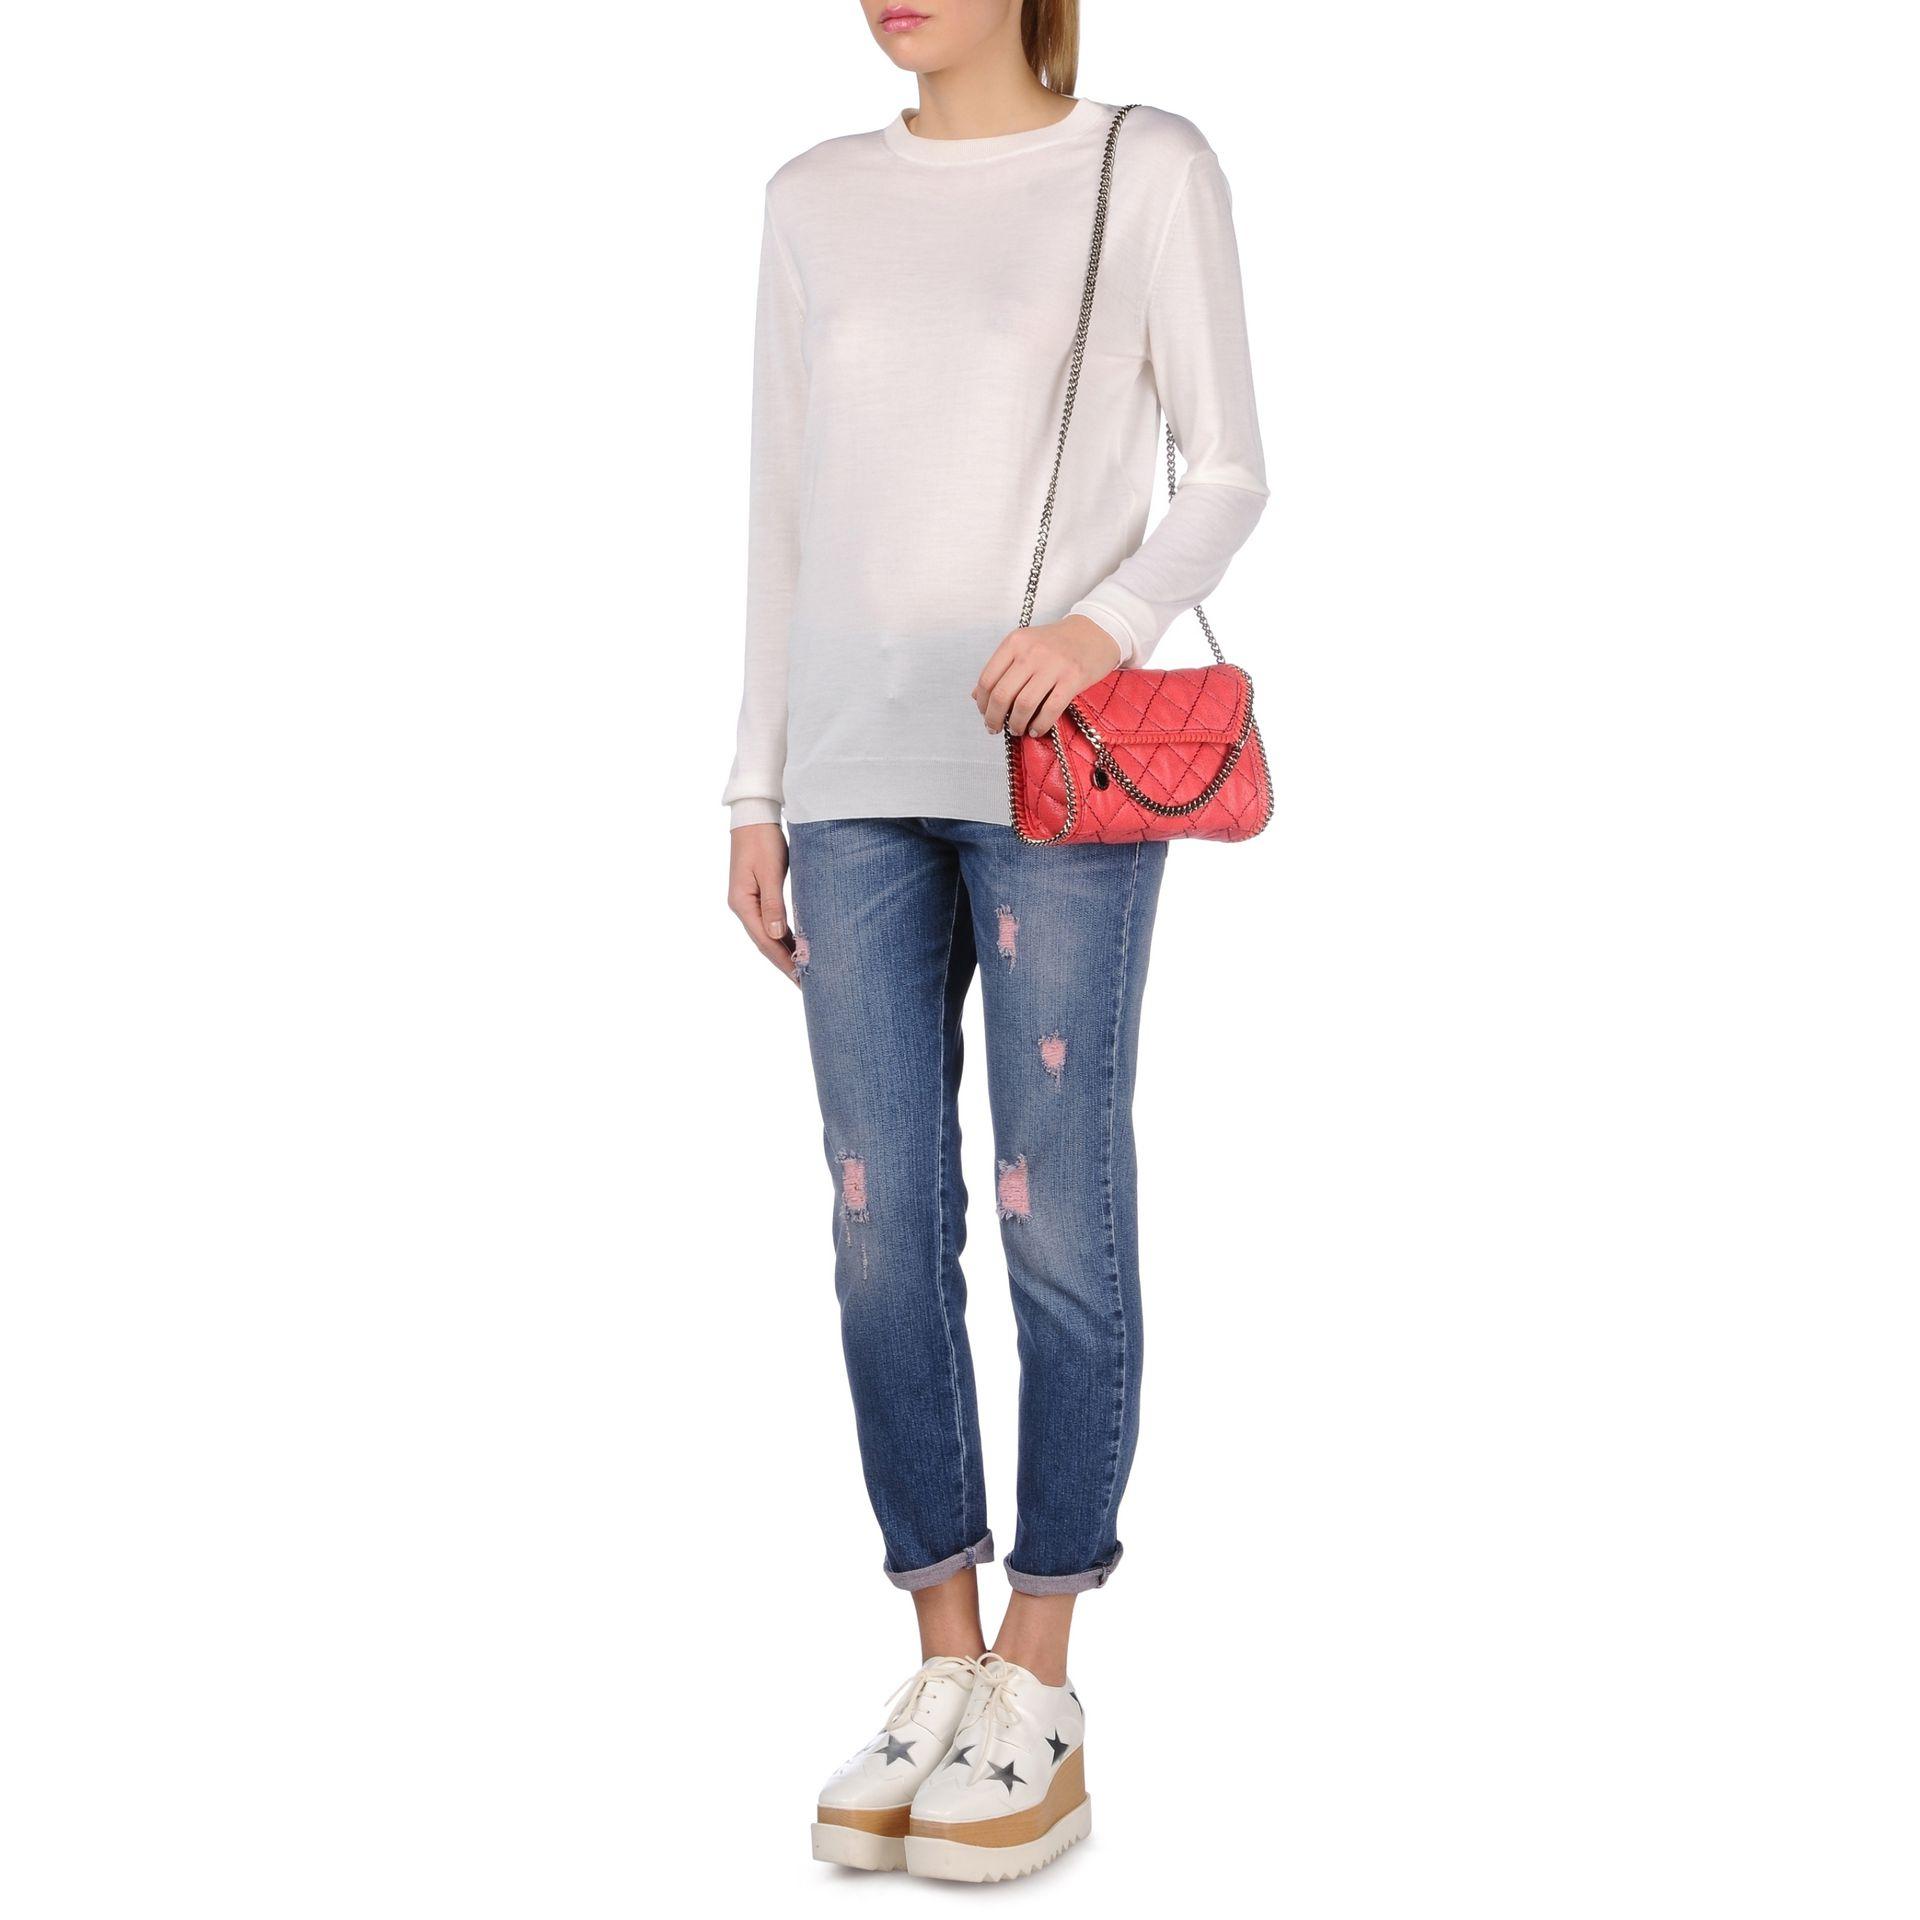 8fda9fe0033a Lyst - Stella McCartney Falabella Quilted Mini Bag in Pink